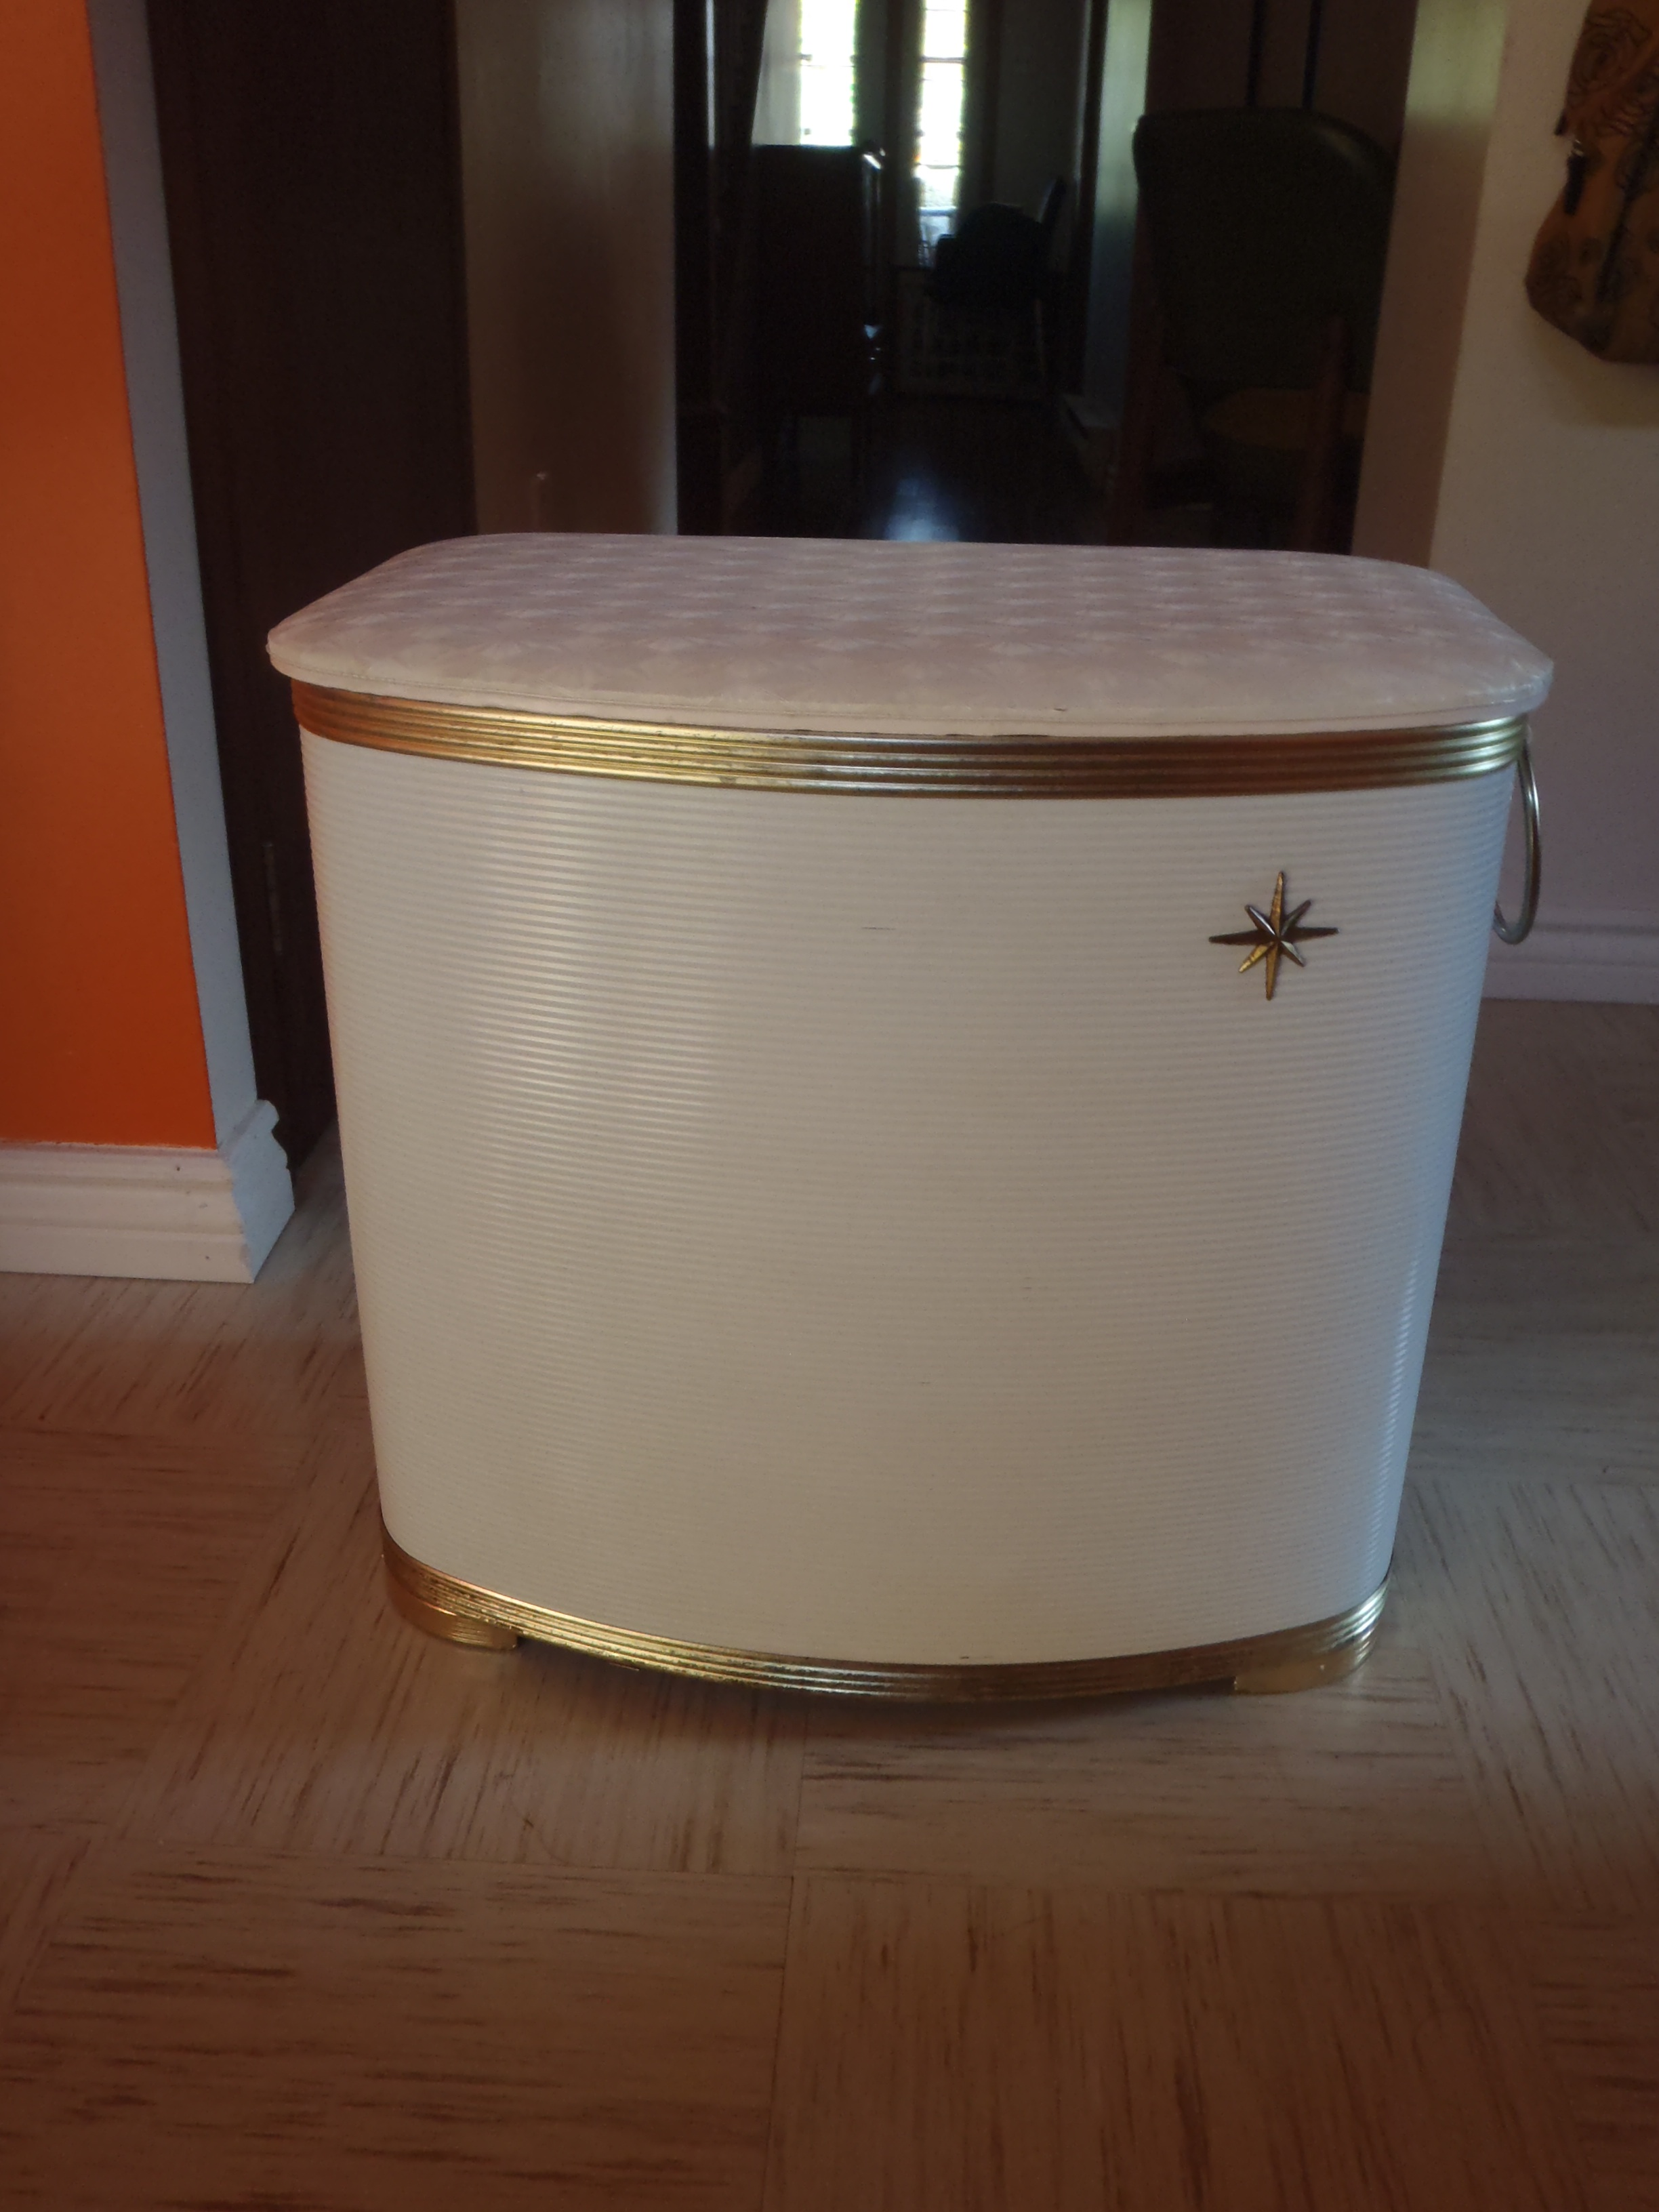 olympus digital camera. Black Bedroom Furniture Sets. Home Design Ideas